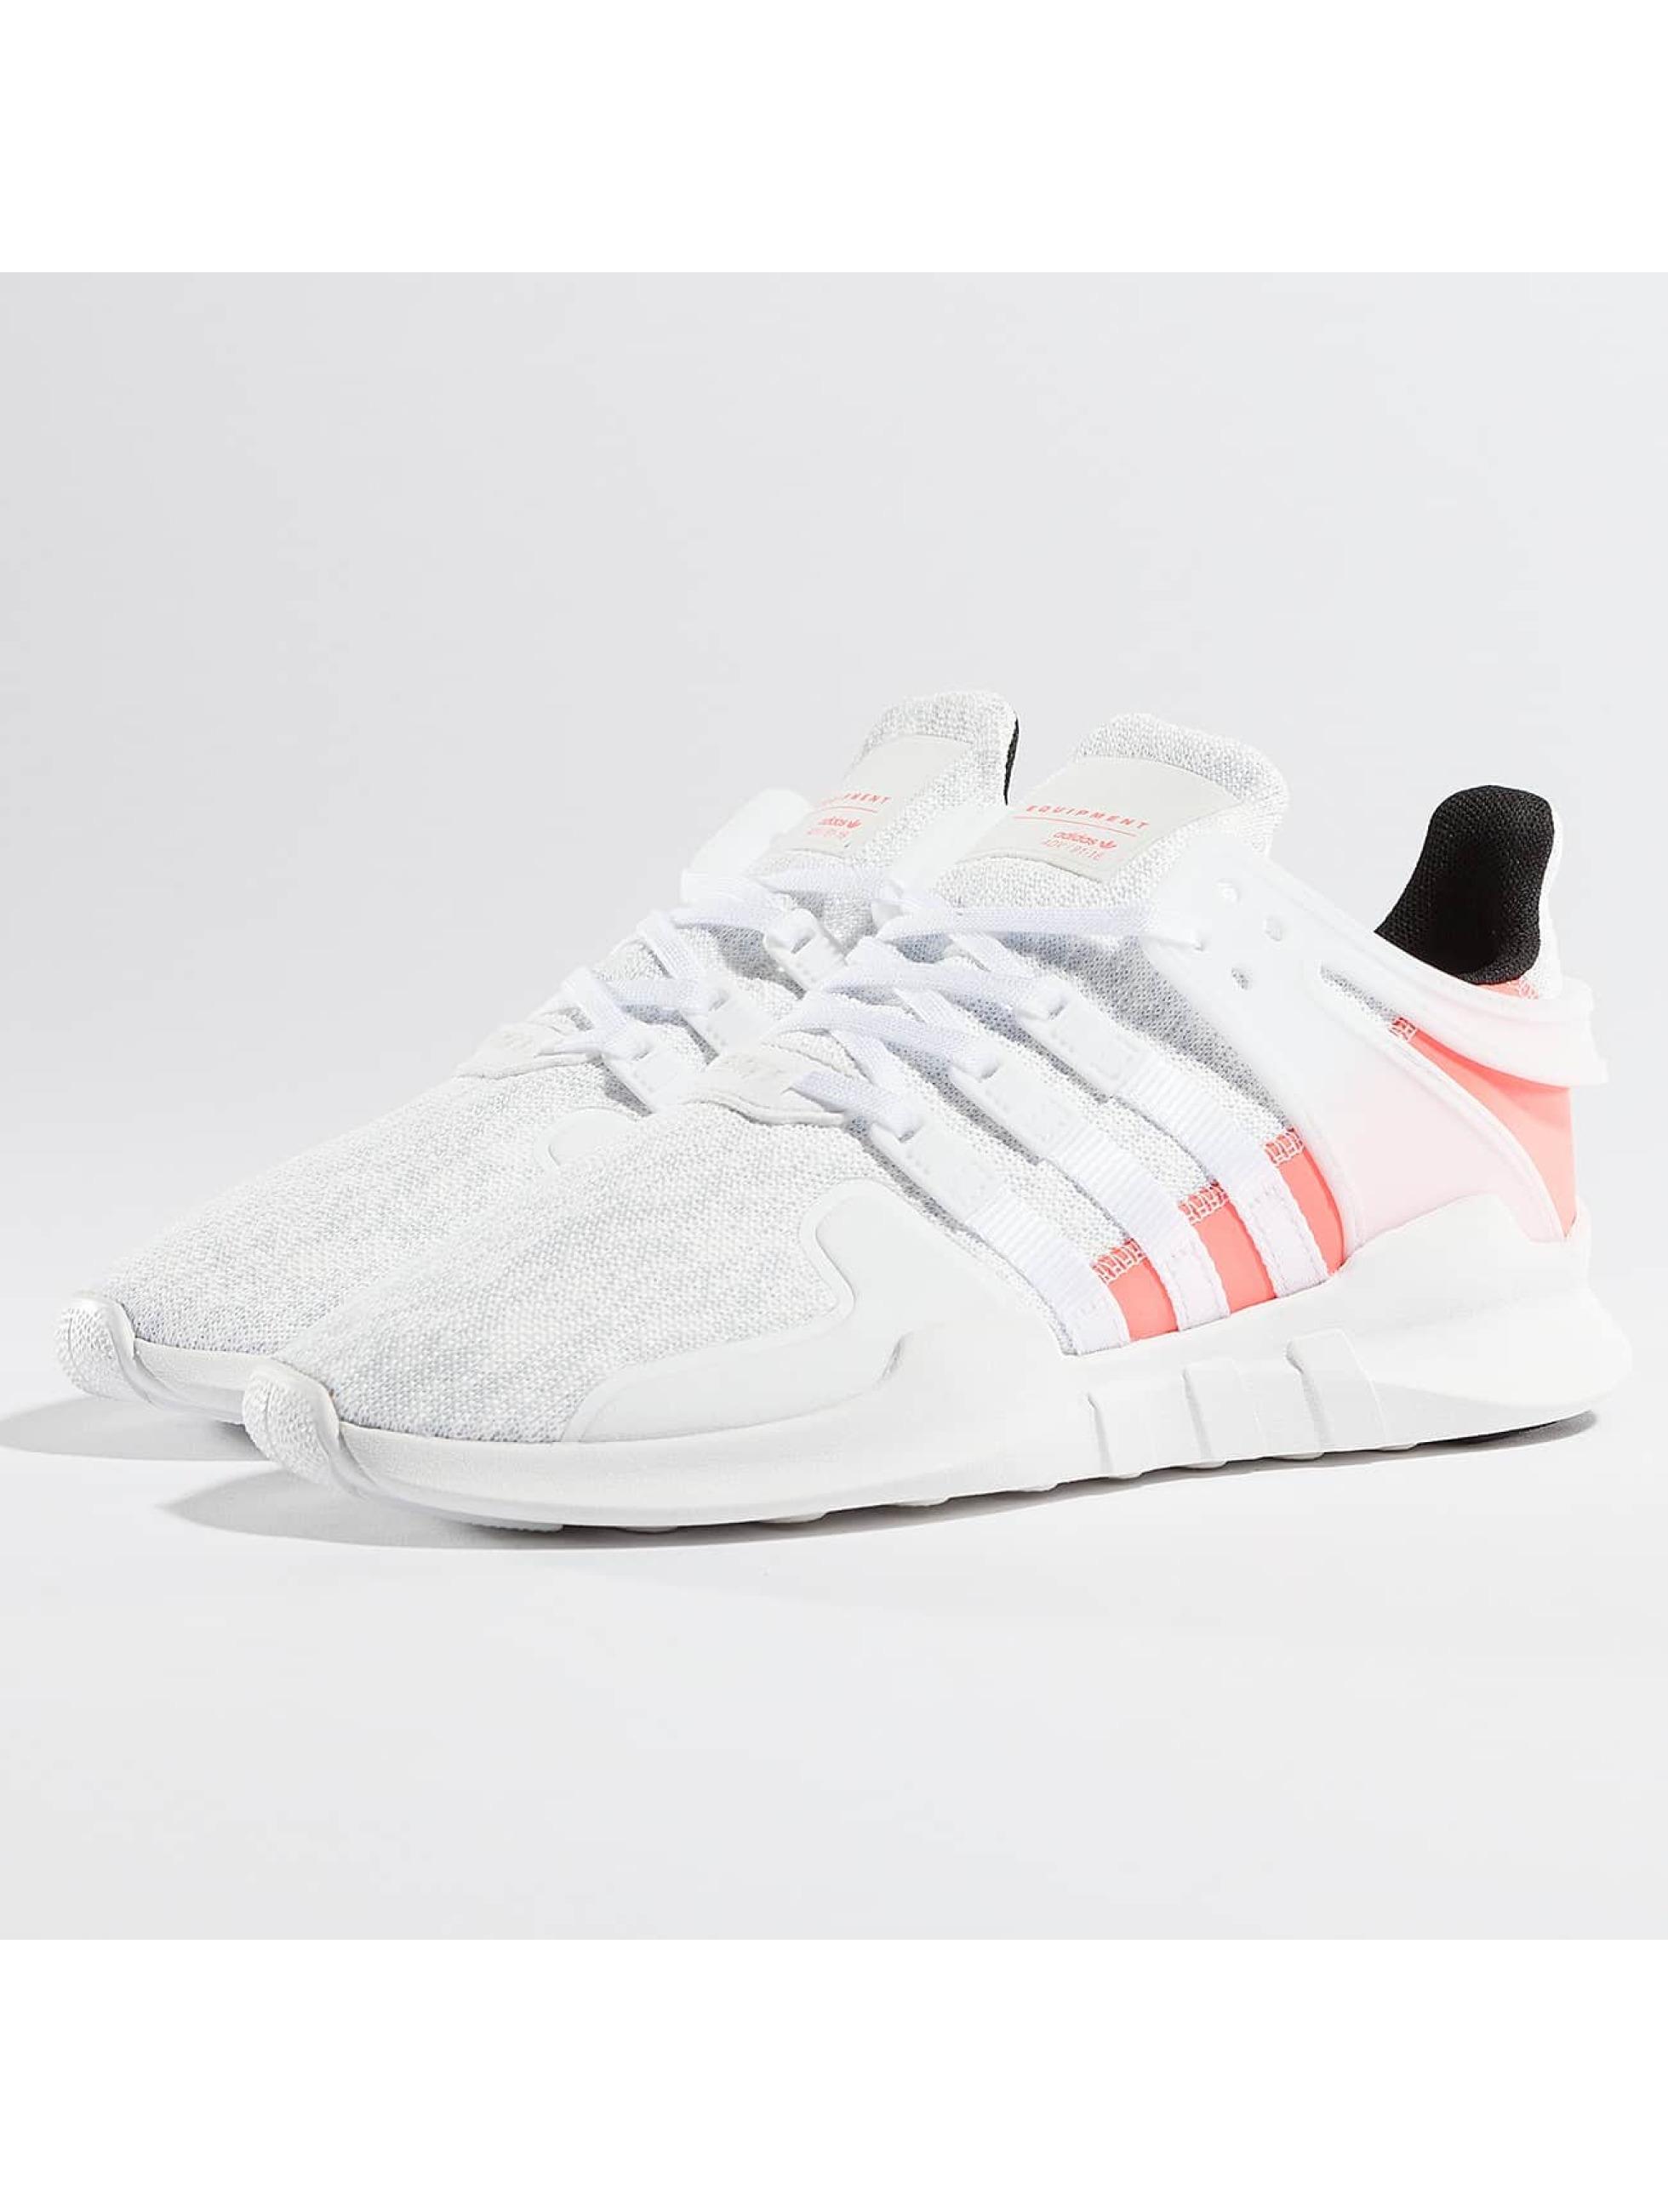 adidas Frauen Sneaker EQT Support ADV J in weiß